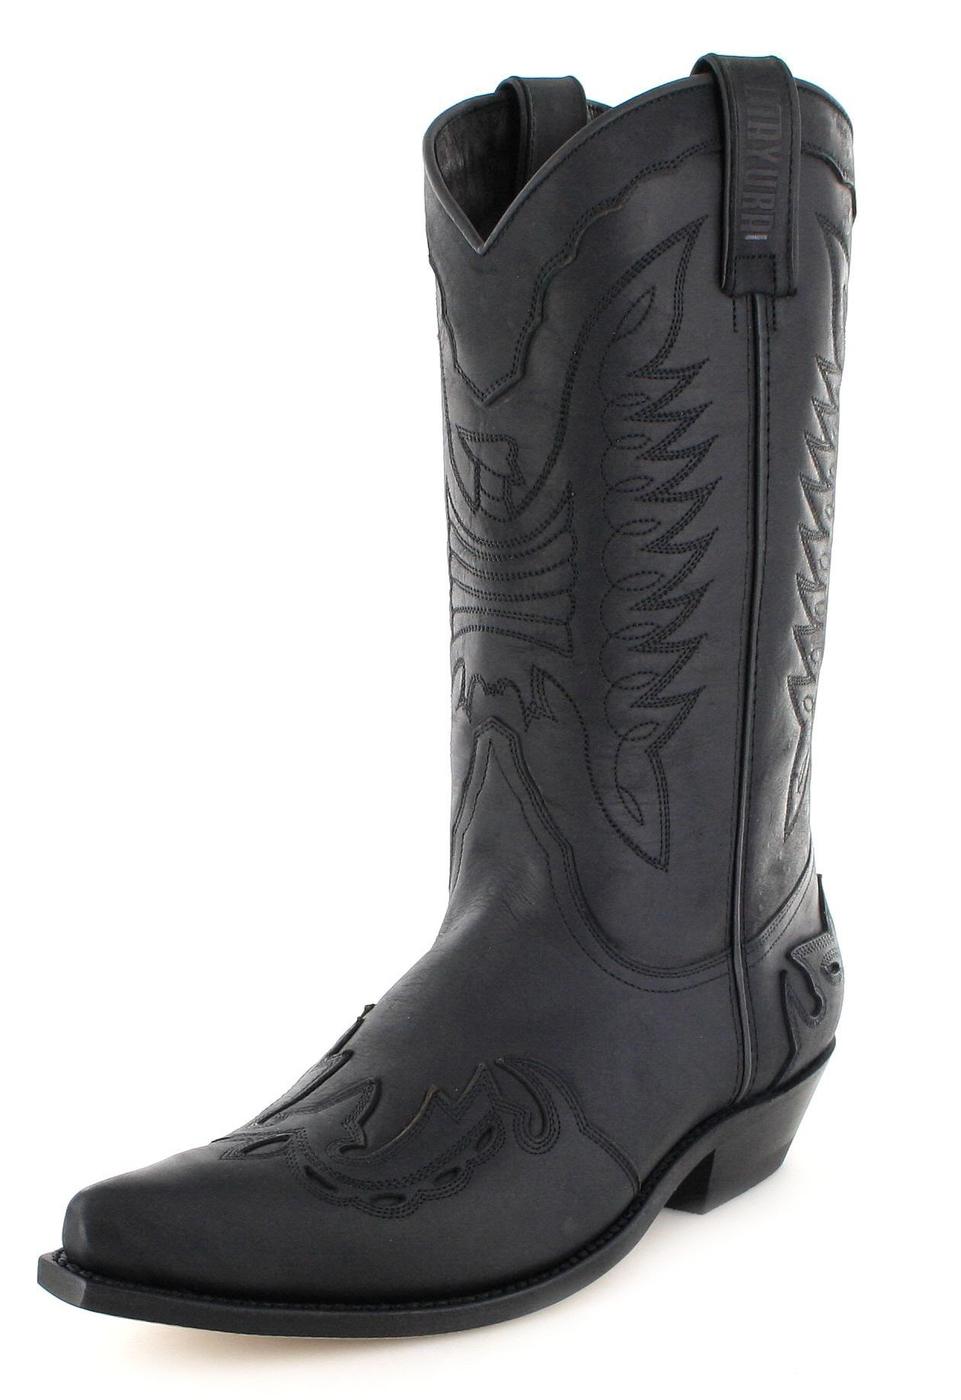 Mayura Boots MB017 Negro Western boot - black